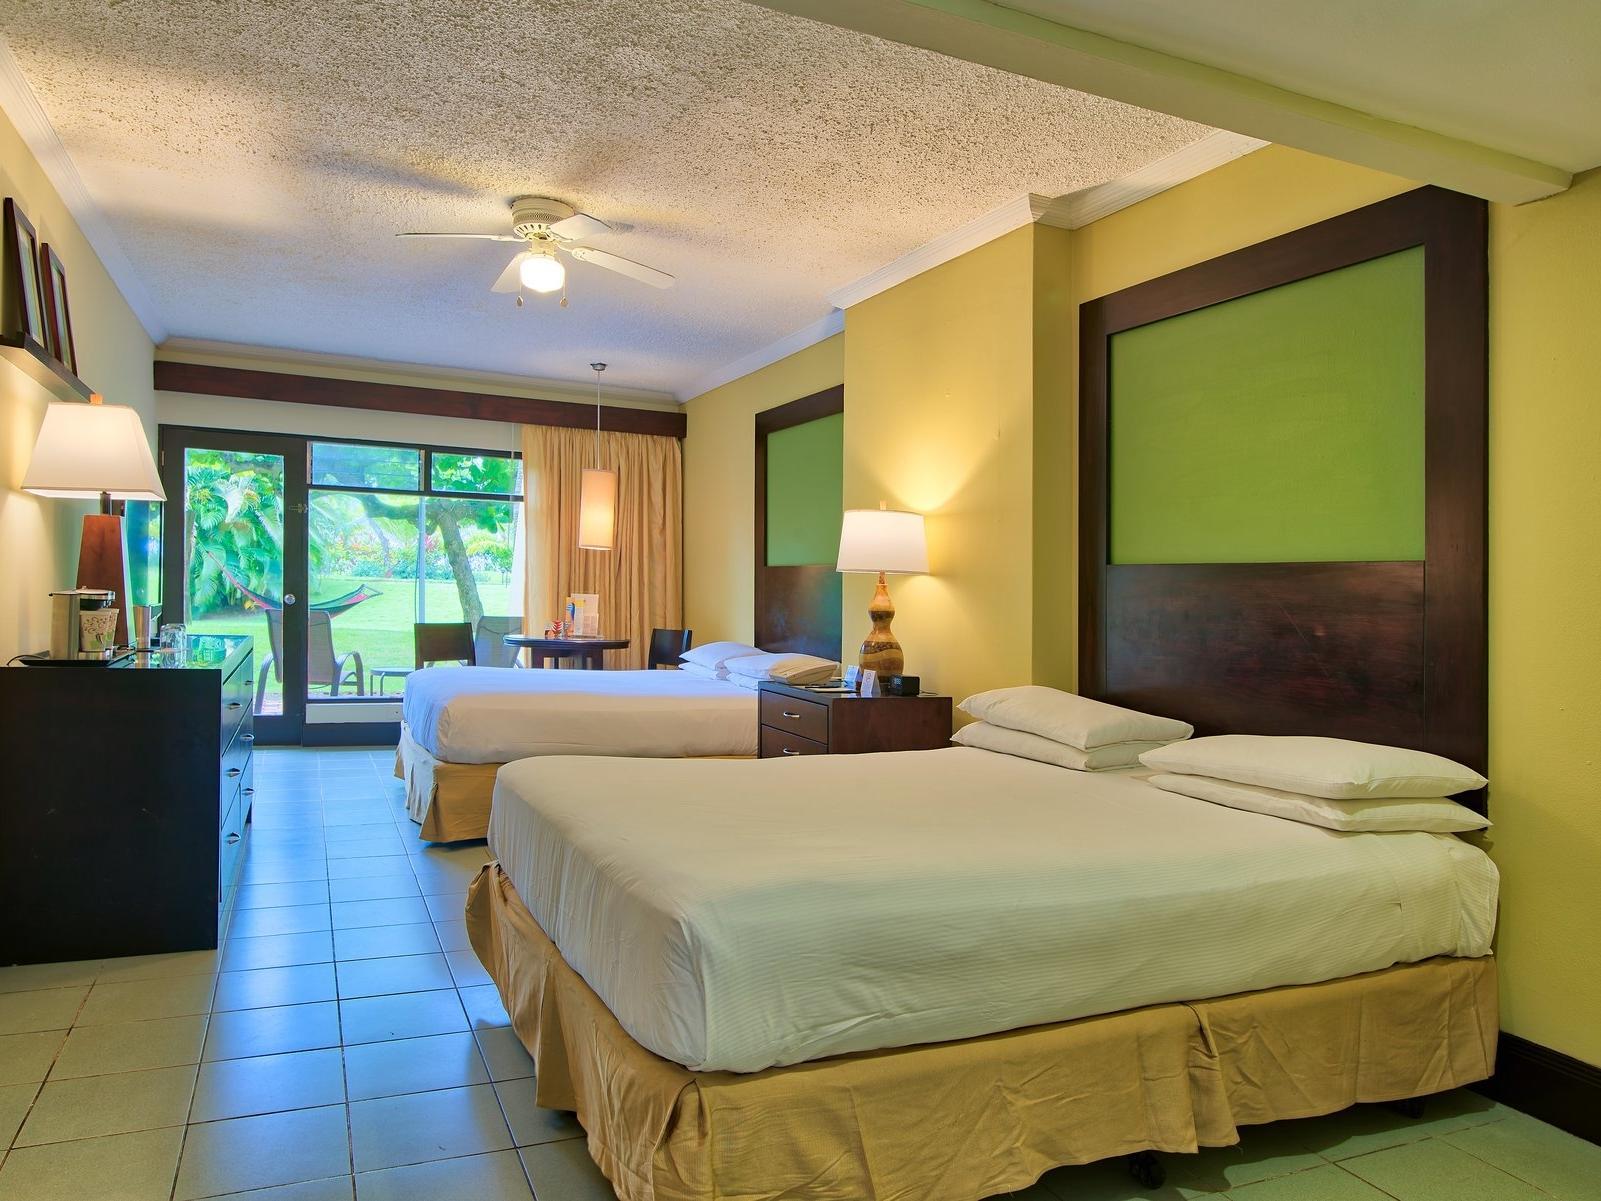 Fiesta 2 double beds with window view at fiesta resort